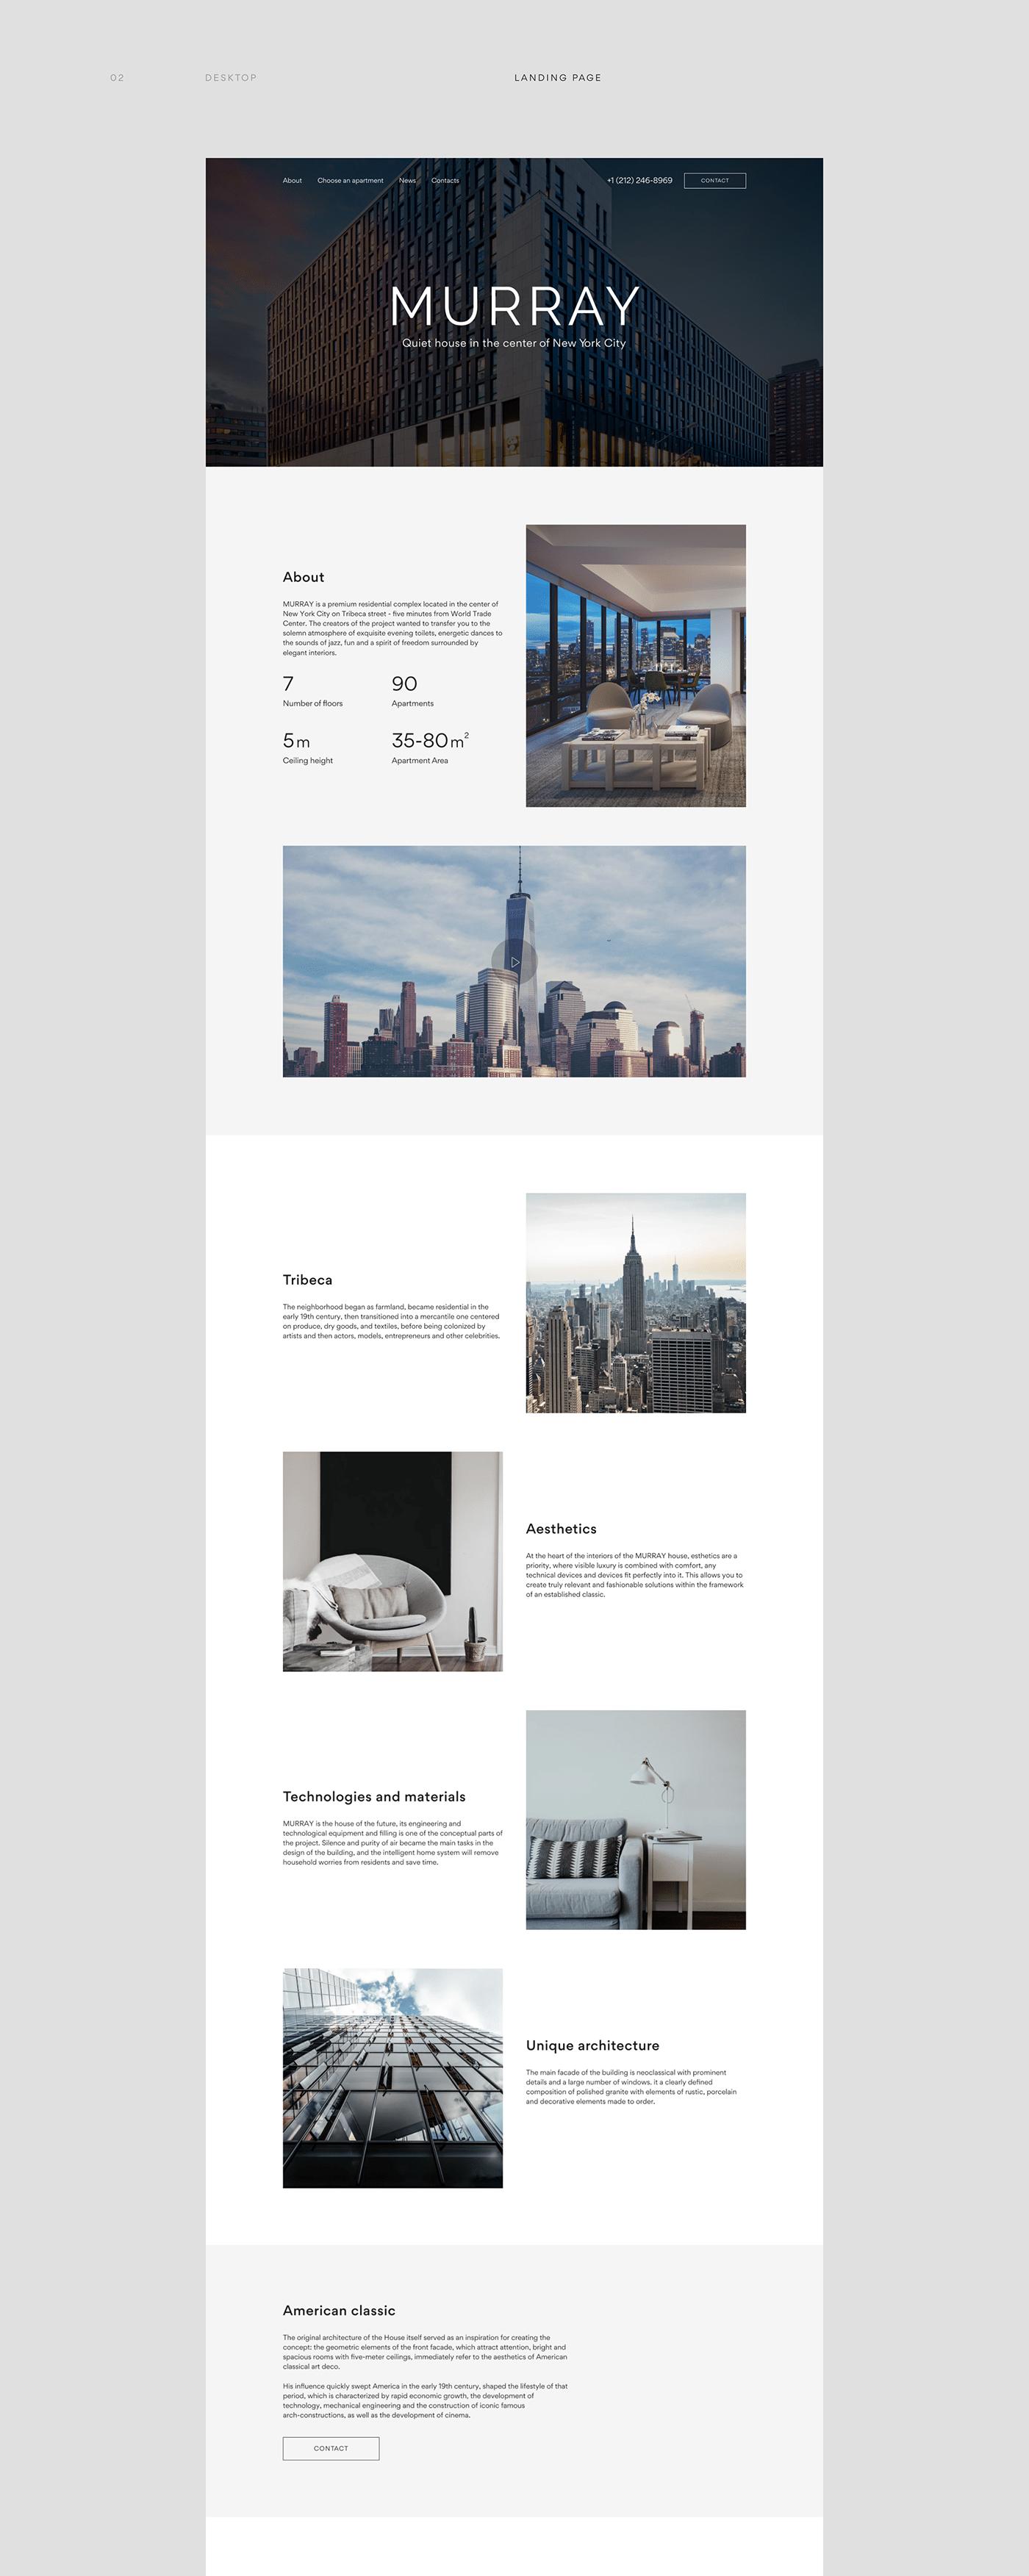 Image may contain: skyscraper and screenshot